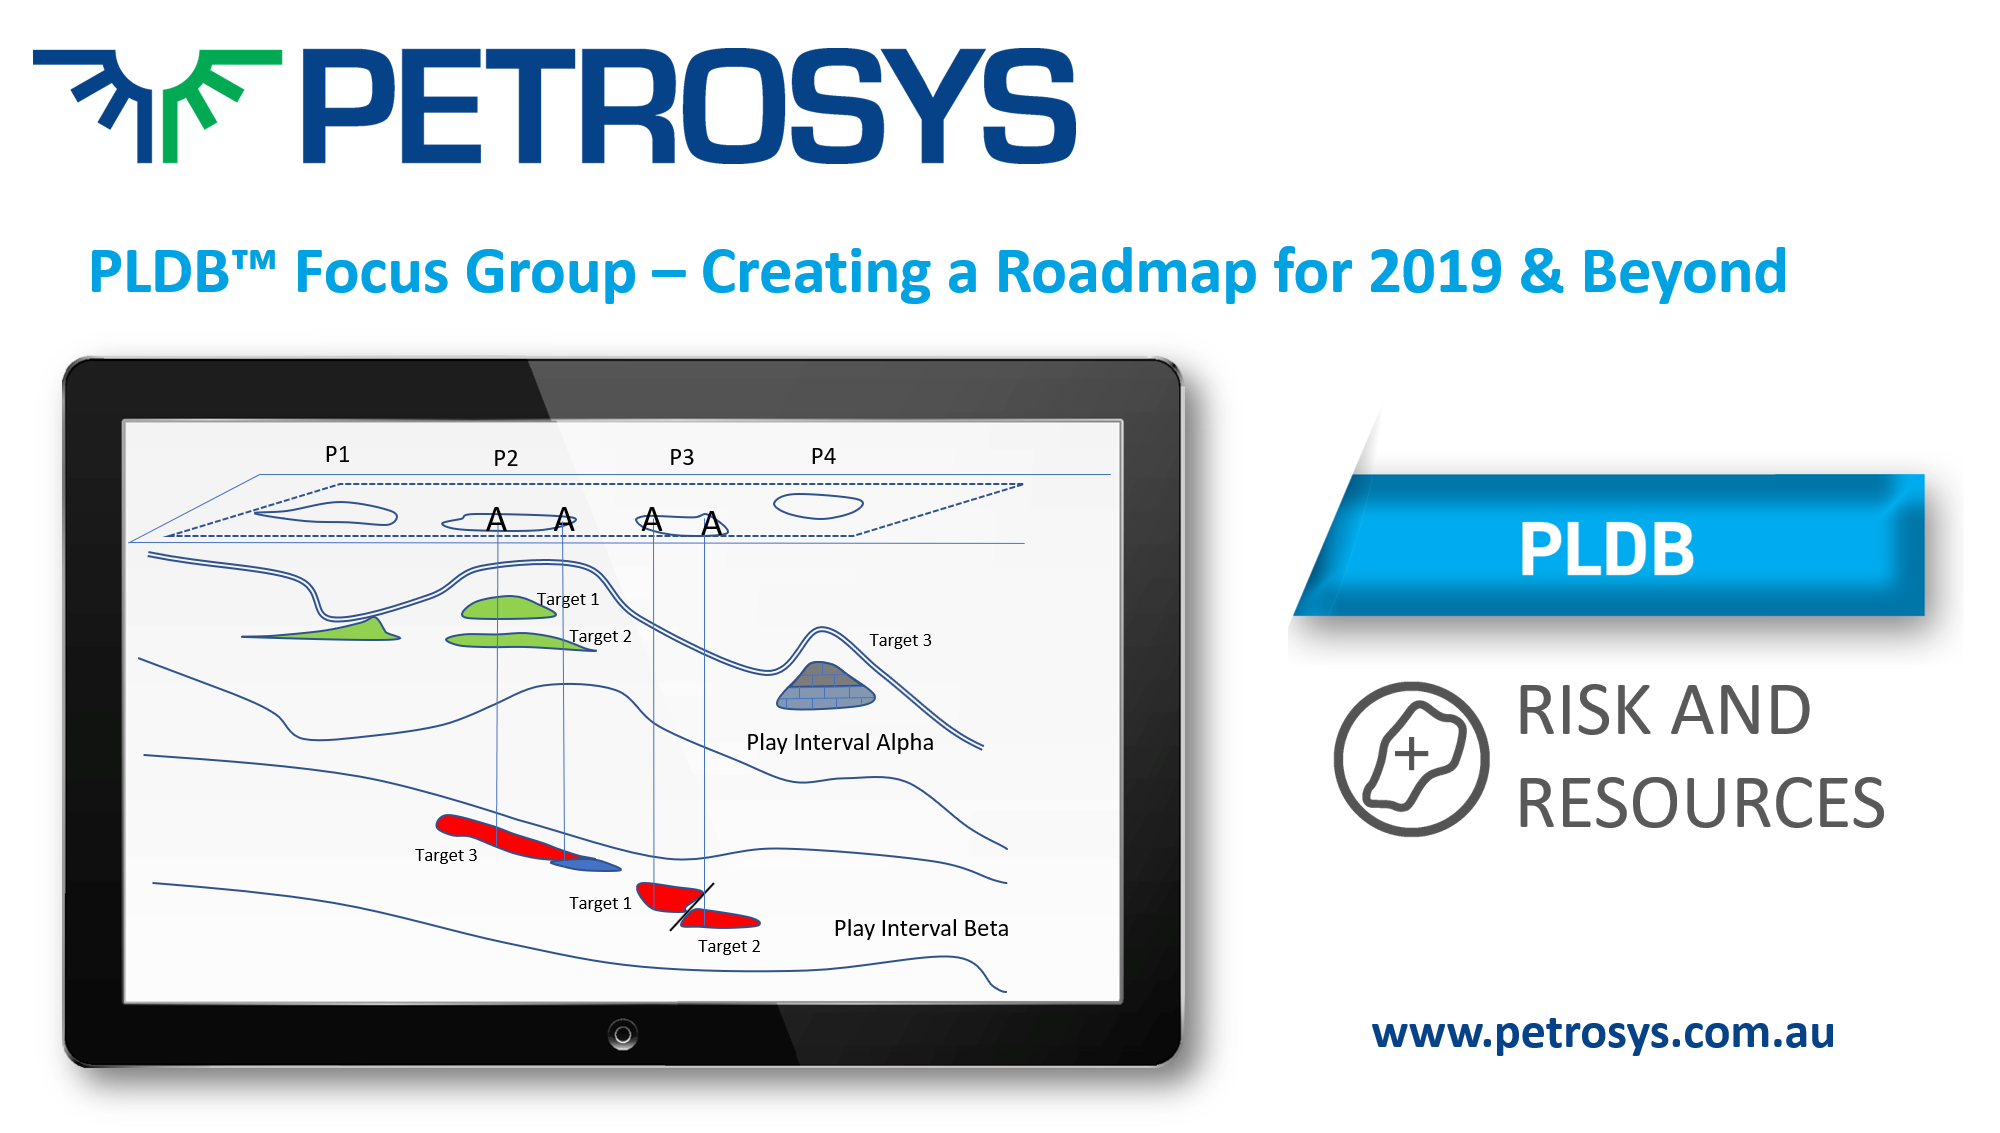 PLDB™ Focus Group - Creating a Roadmap for 2019 & Beyond